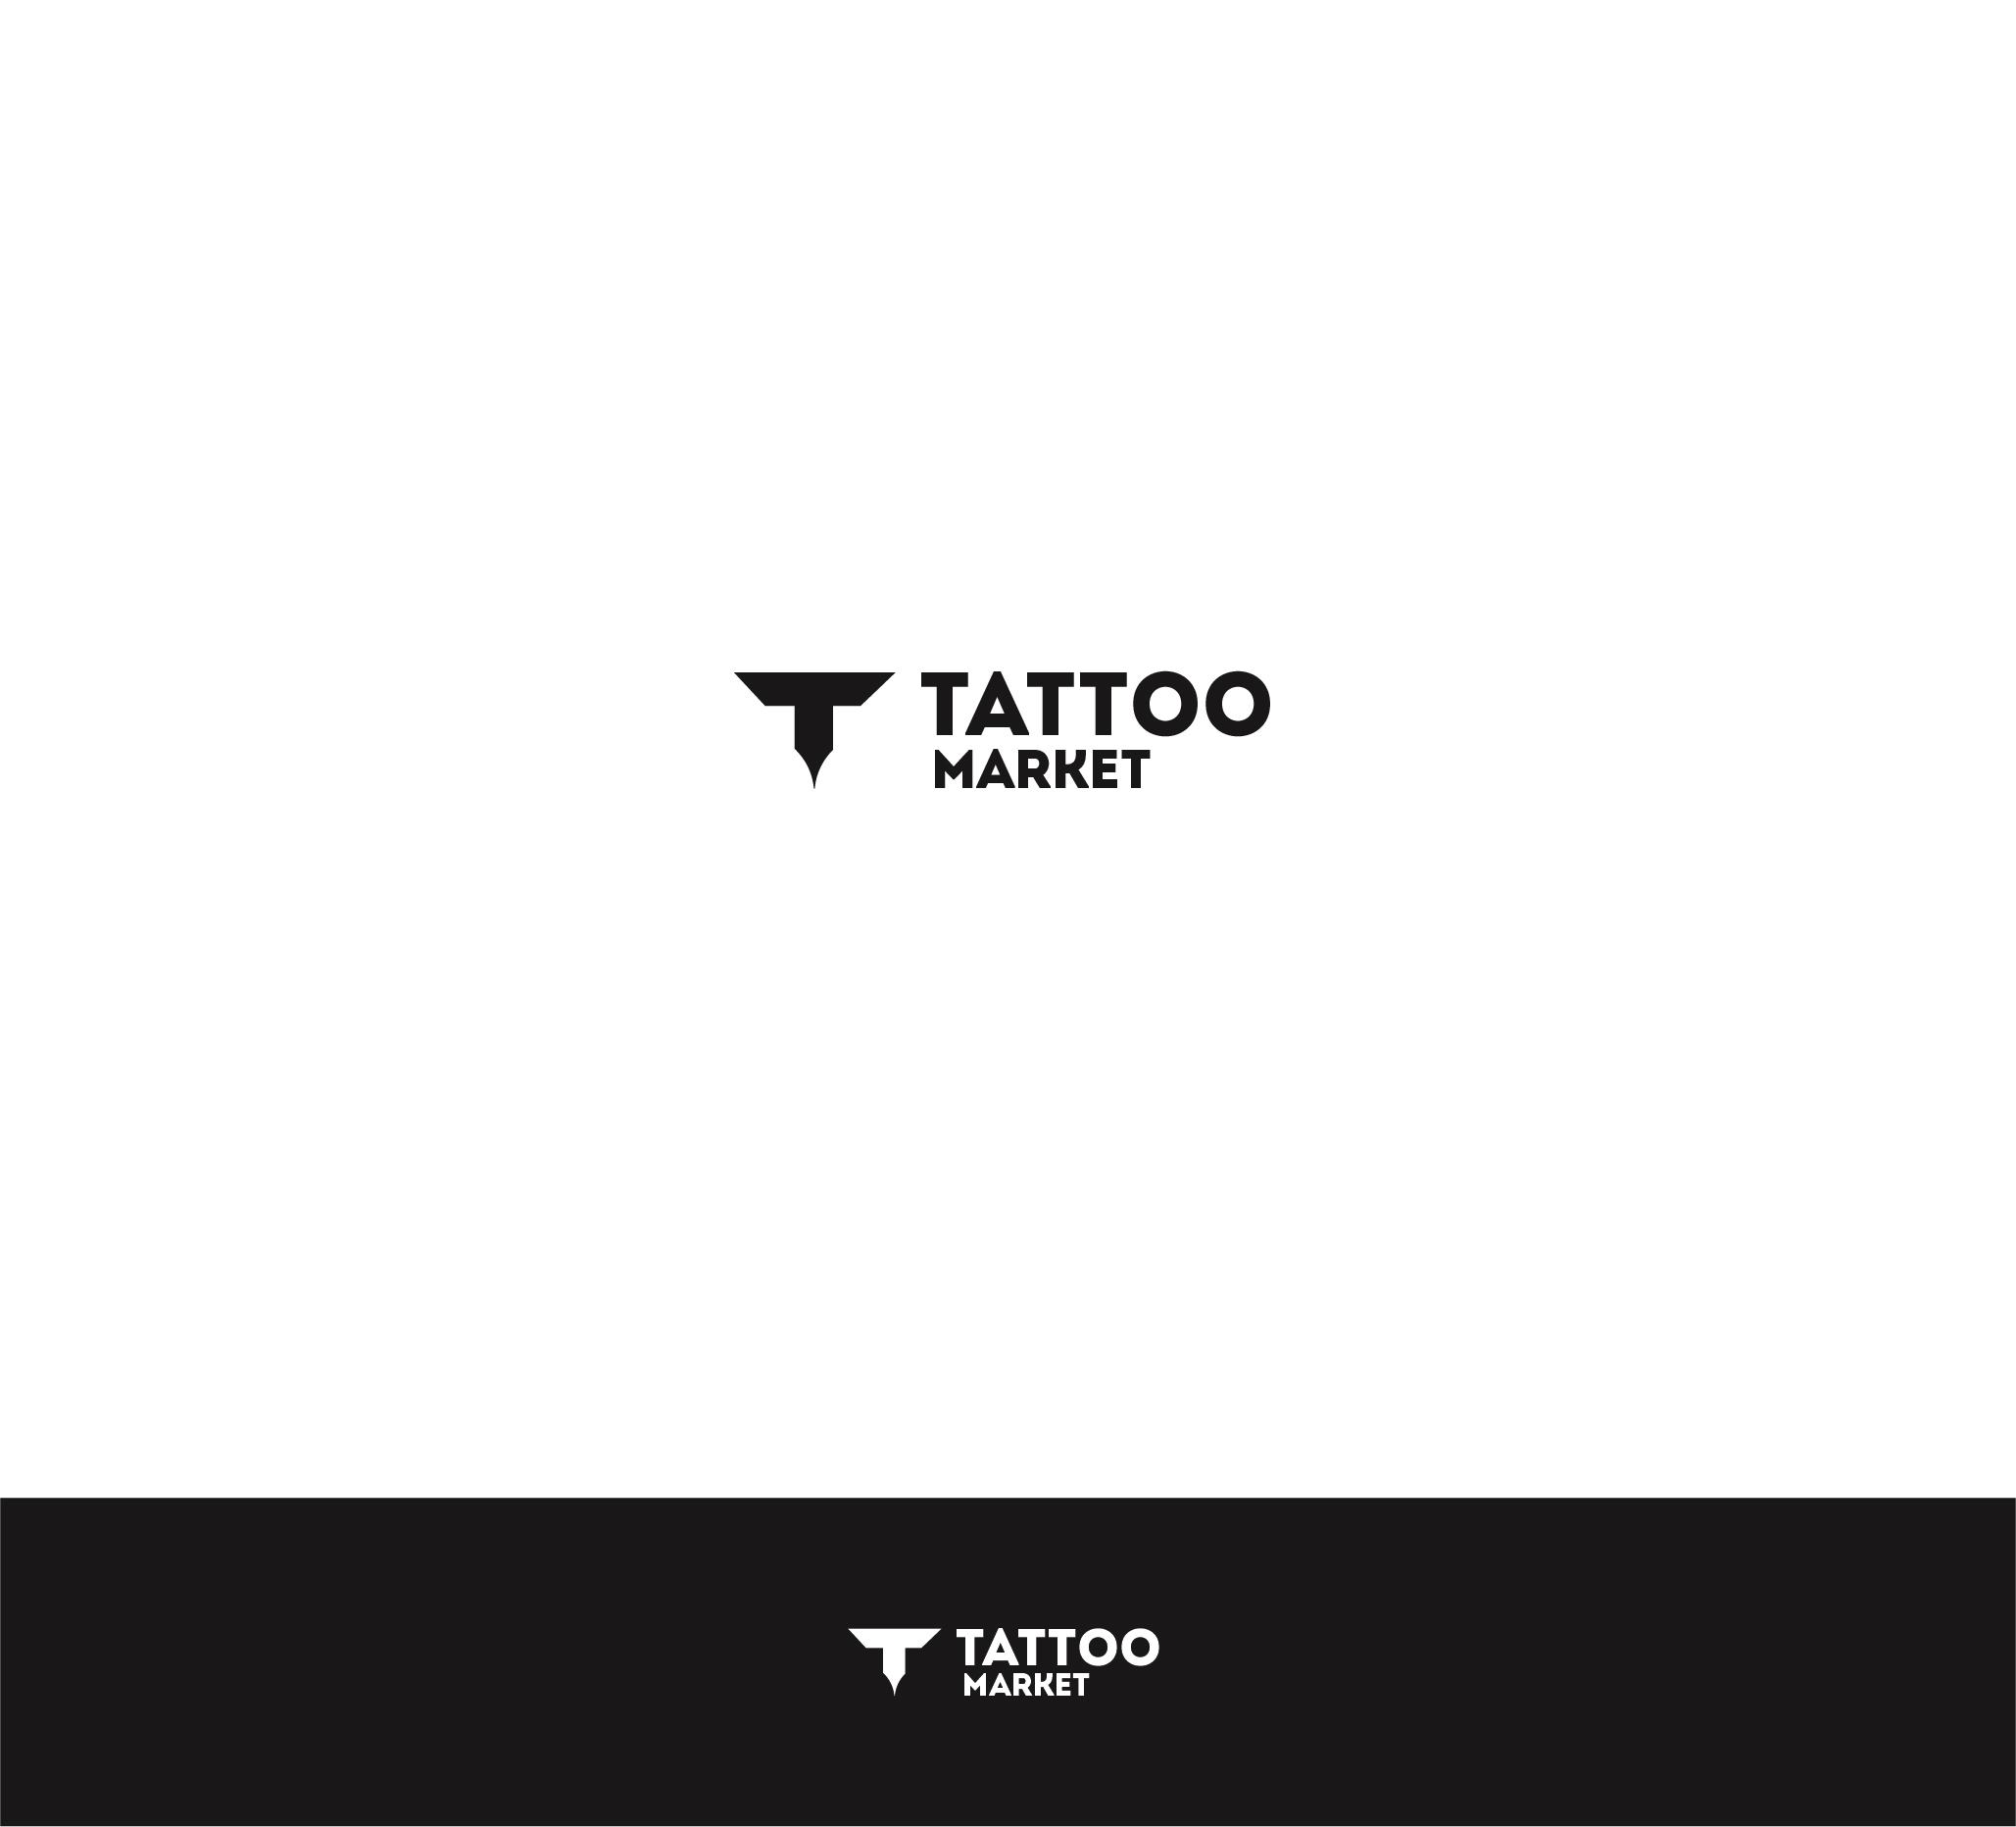 Редизайн логотипа магазина тату оборудования TattooMarket.ru фото f_7405c48cdc18e9ac.jpg